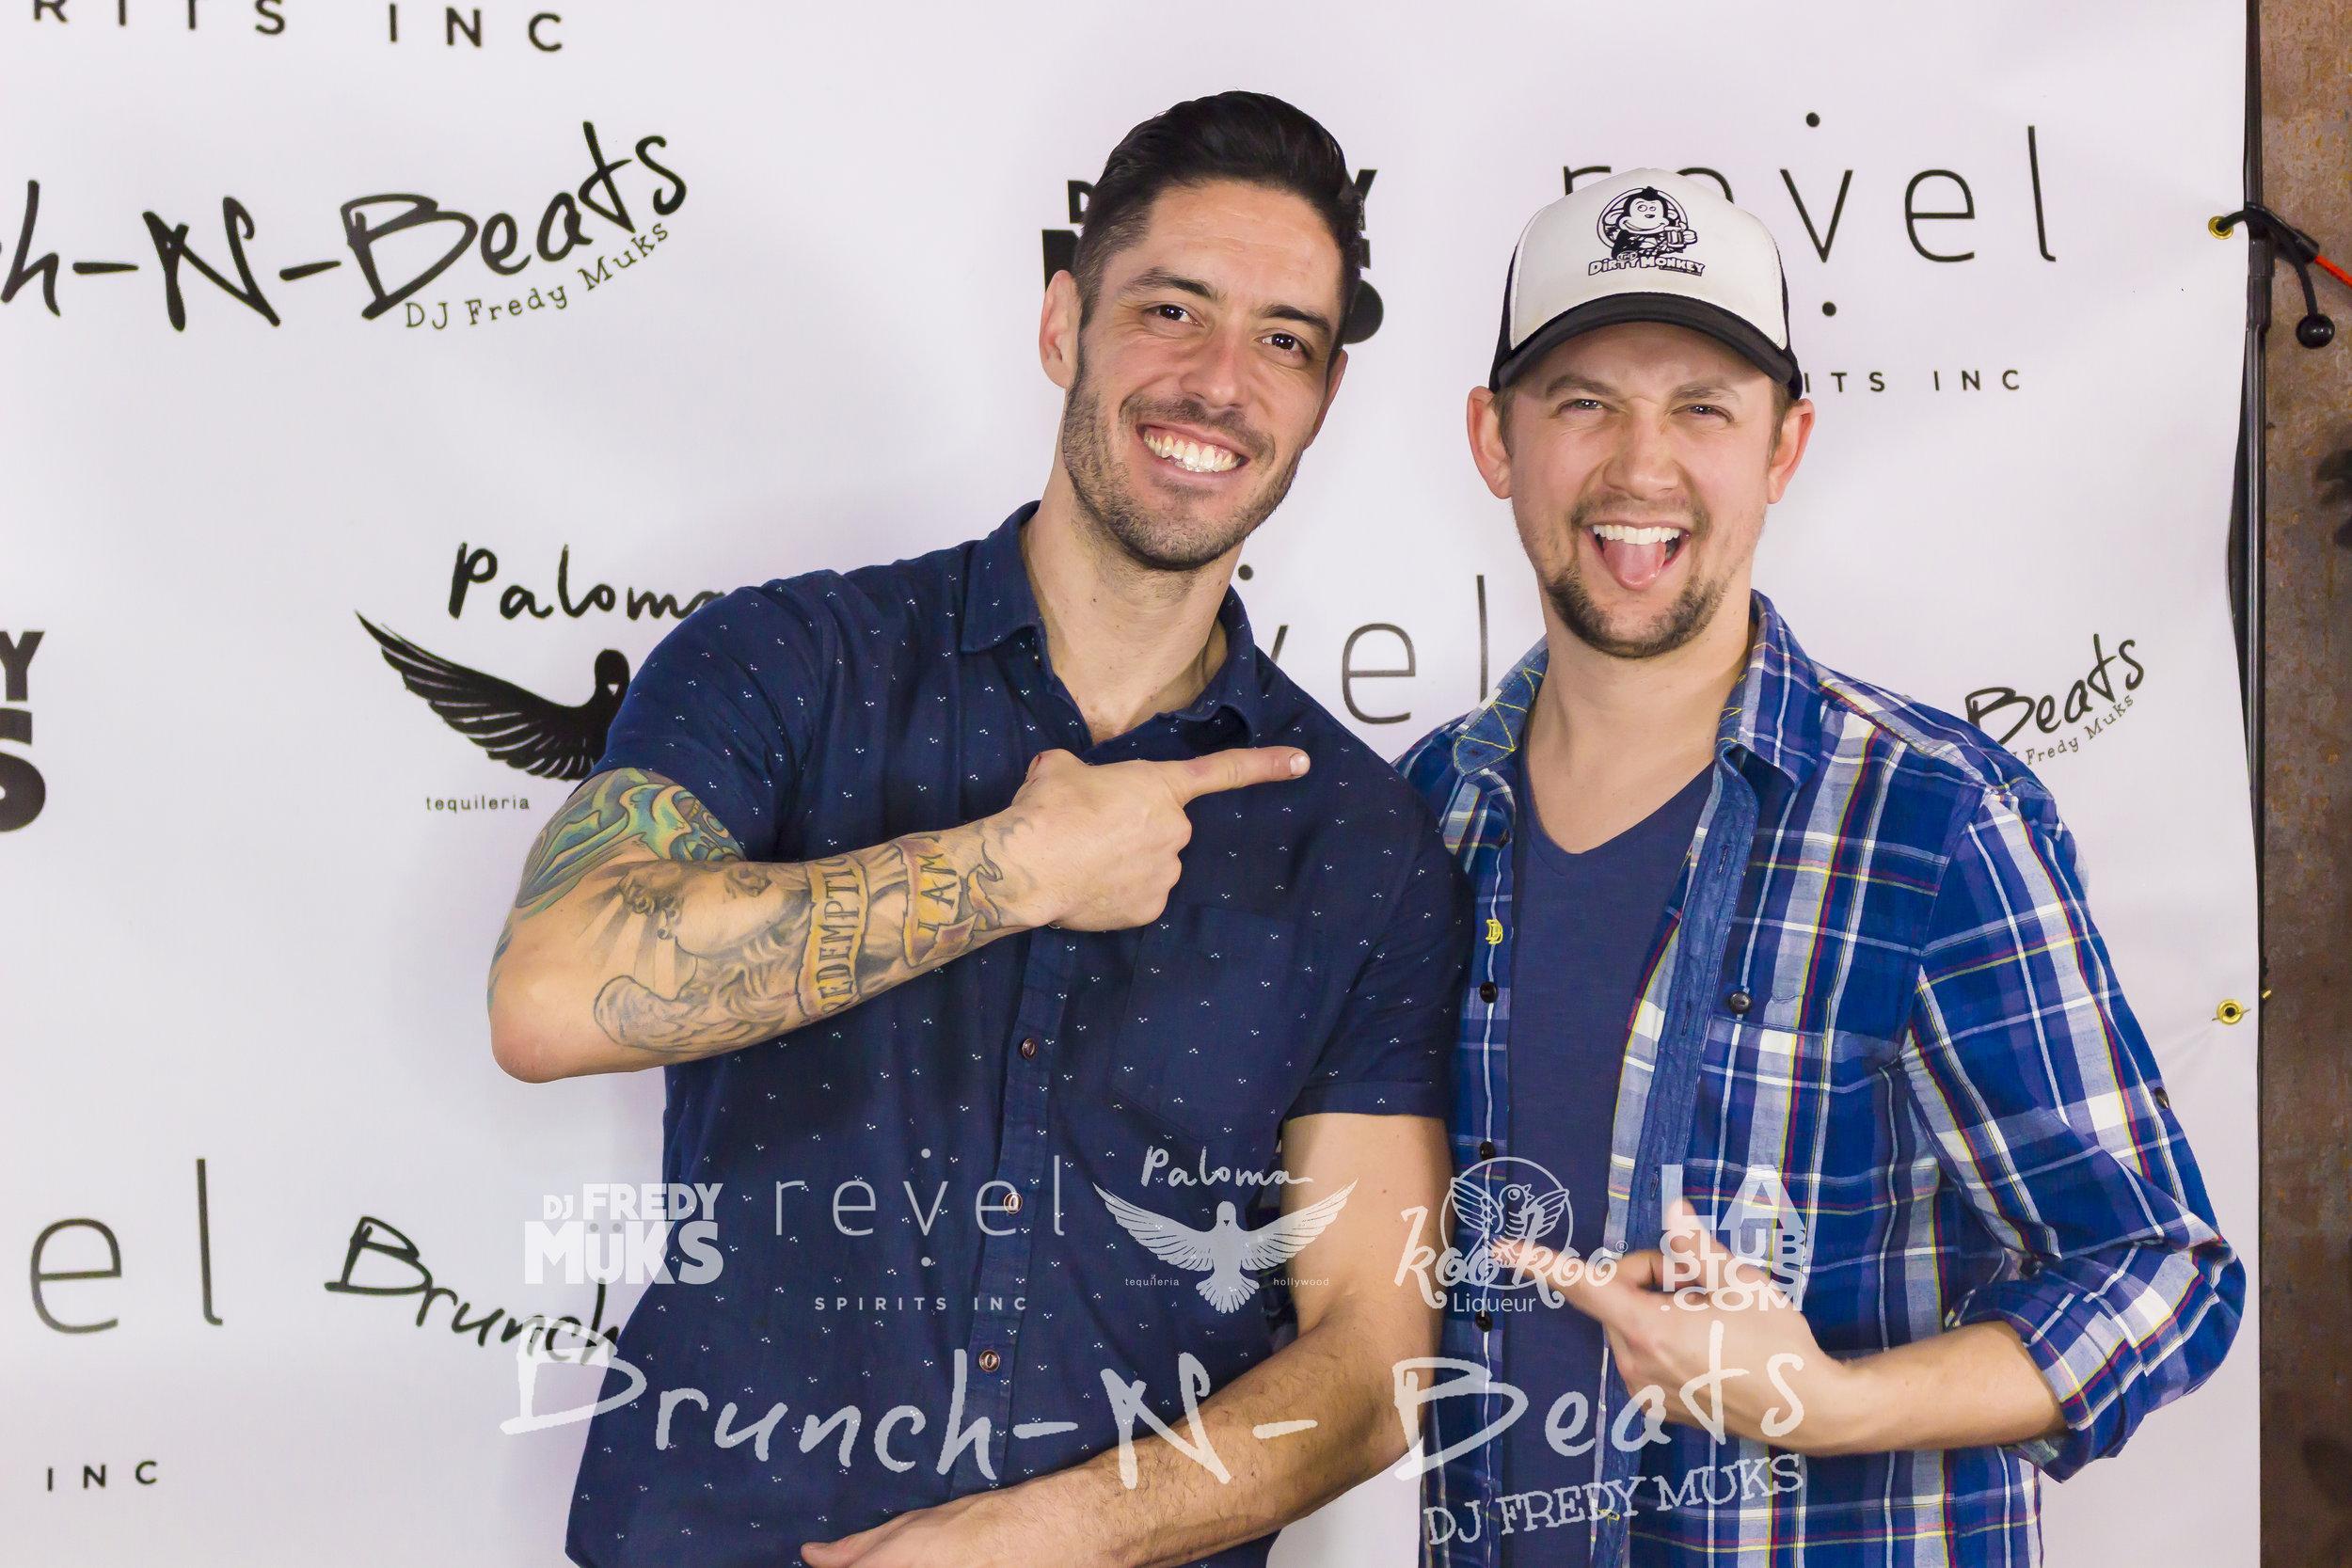 Brunch-N-Beats - Paloma Hollywood - 02-25-18_51.jpg